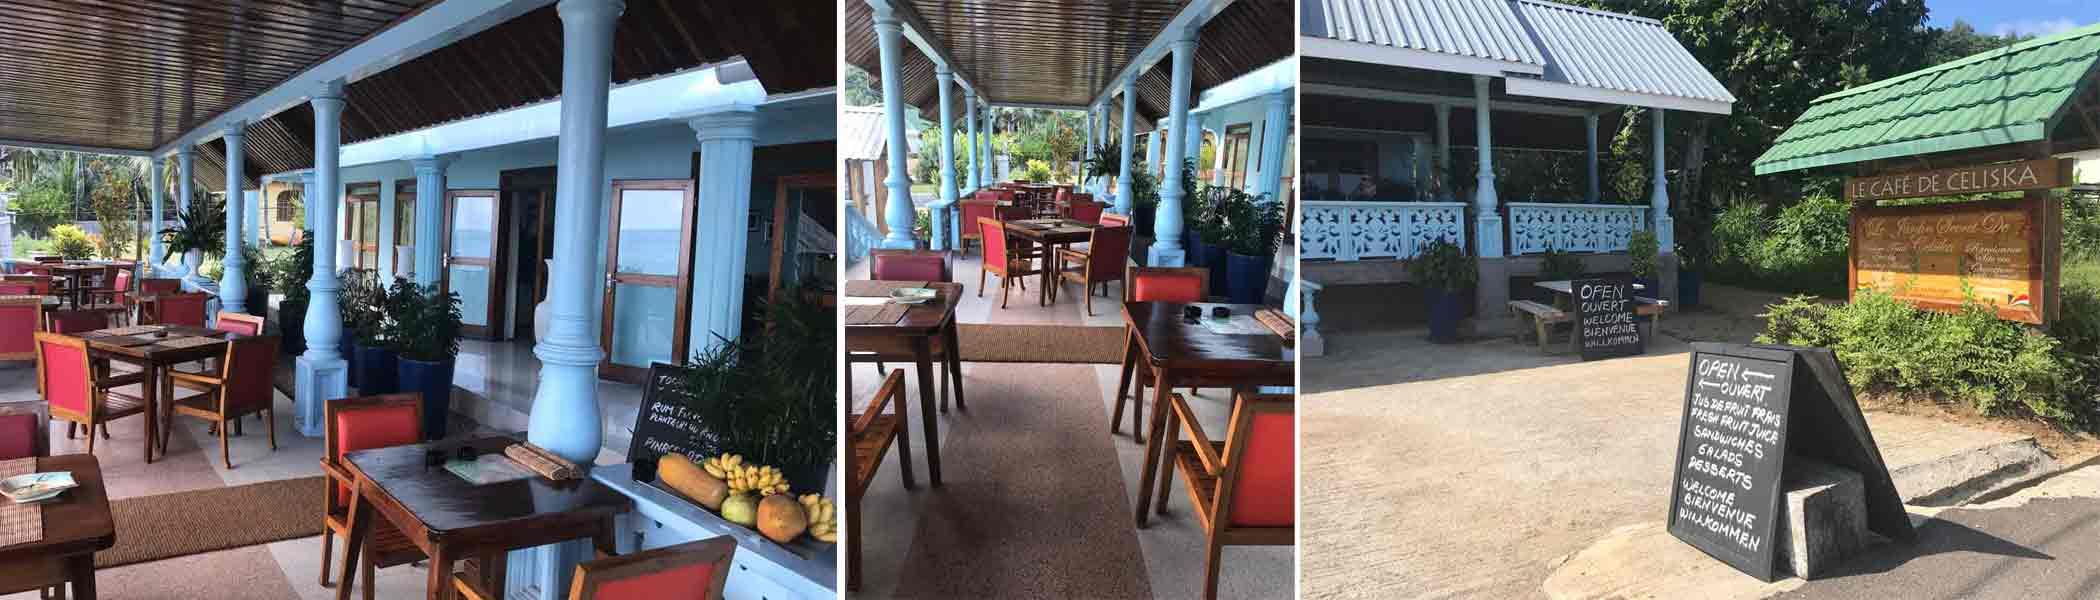 le-cafe-de-celiska, Bars and restaurants in Seychelles Islands